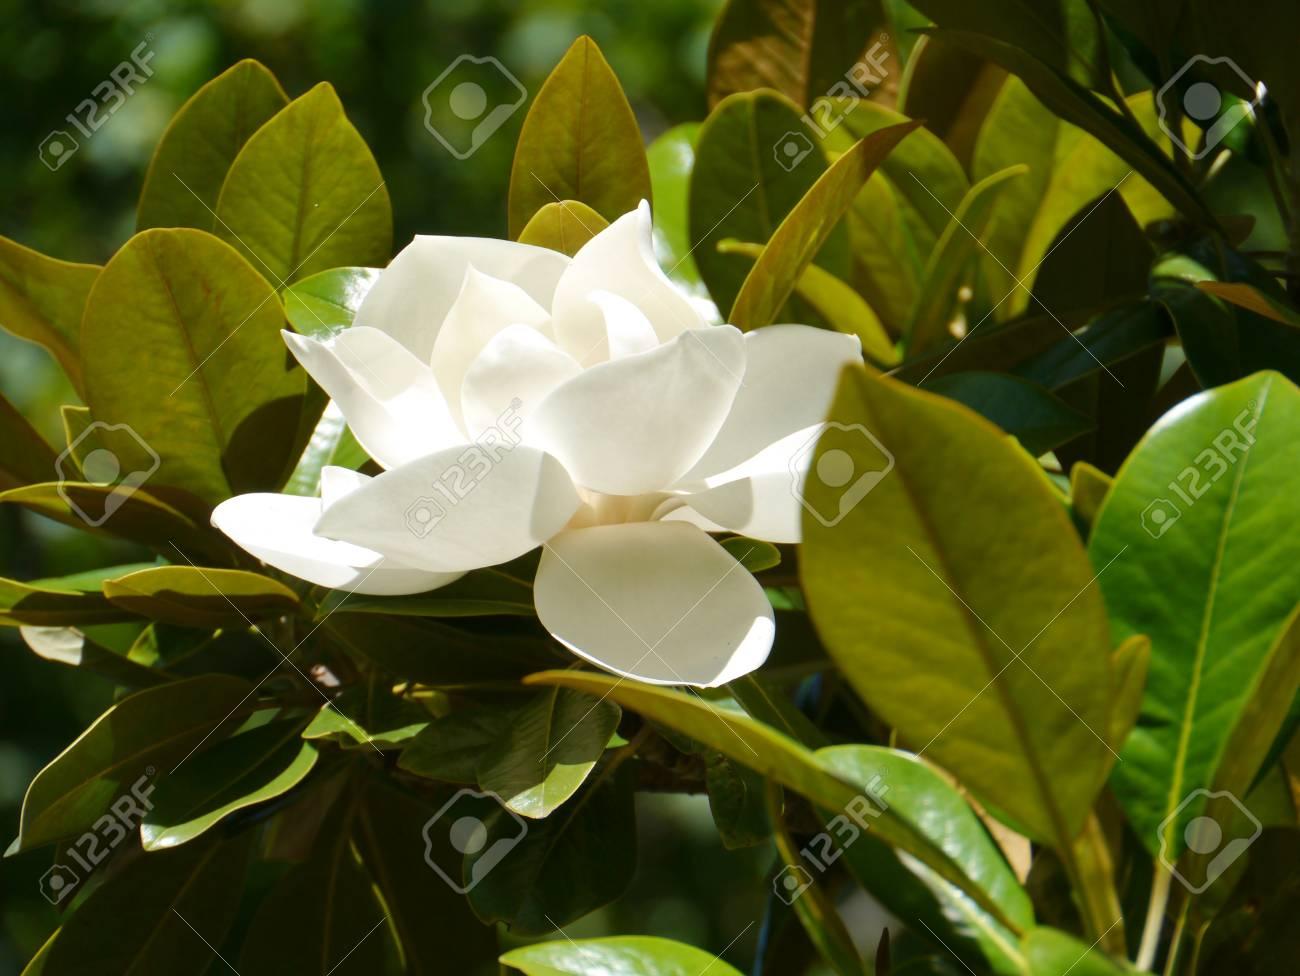 A white flower in a magnolia tree stock photo picture and royalty a white flower in a magnolia tree stock photo 24198036 mightylinksfo